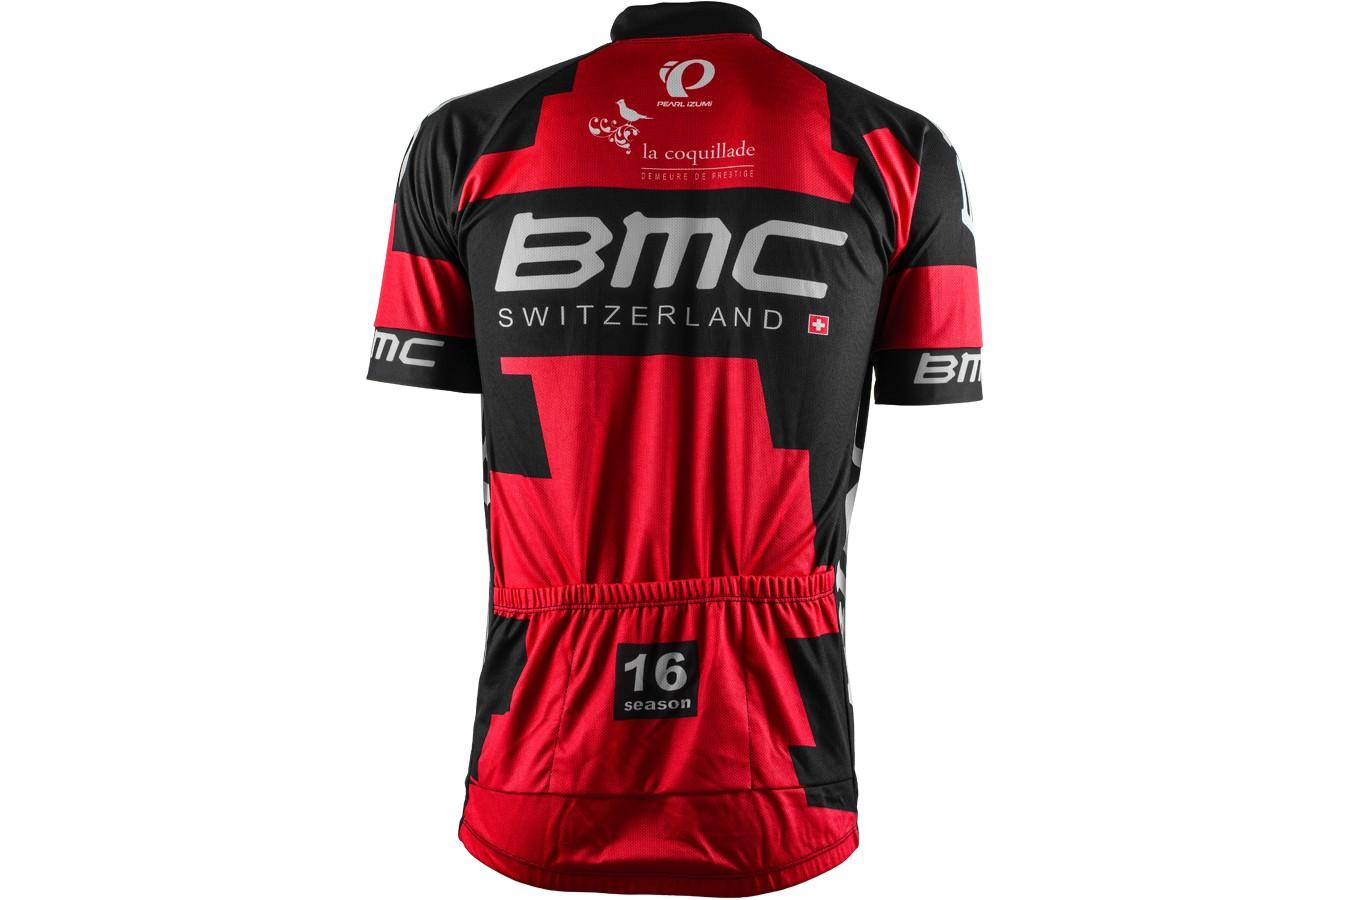 Camisa Ciclista Sky - Cabani